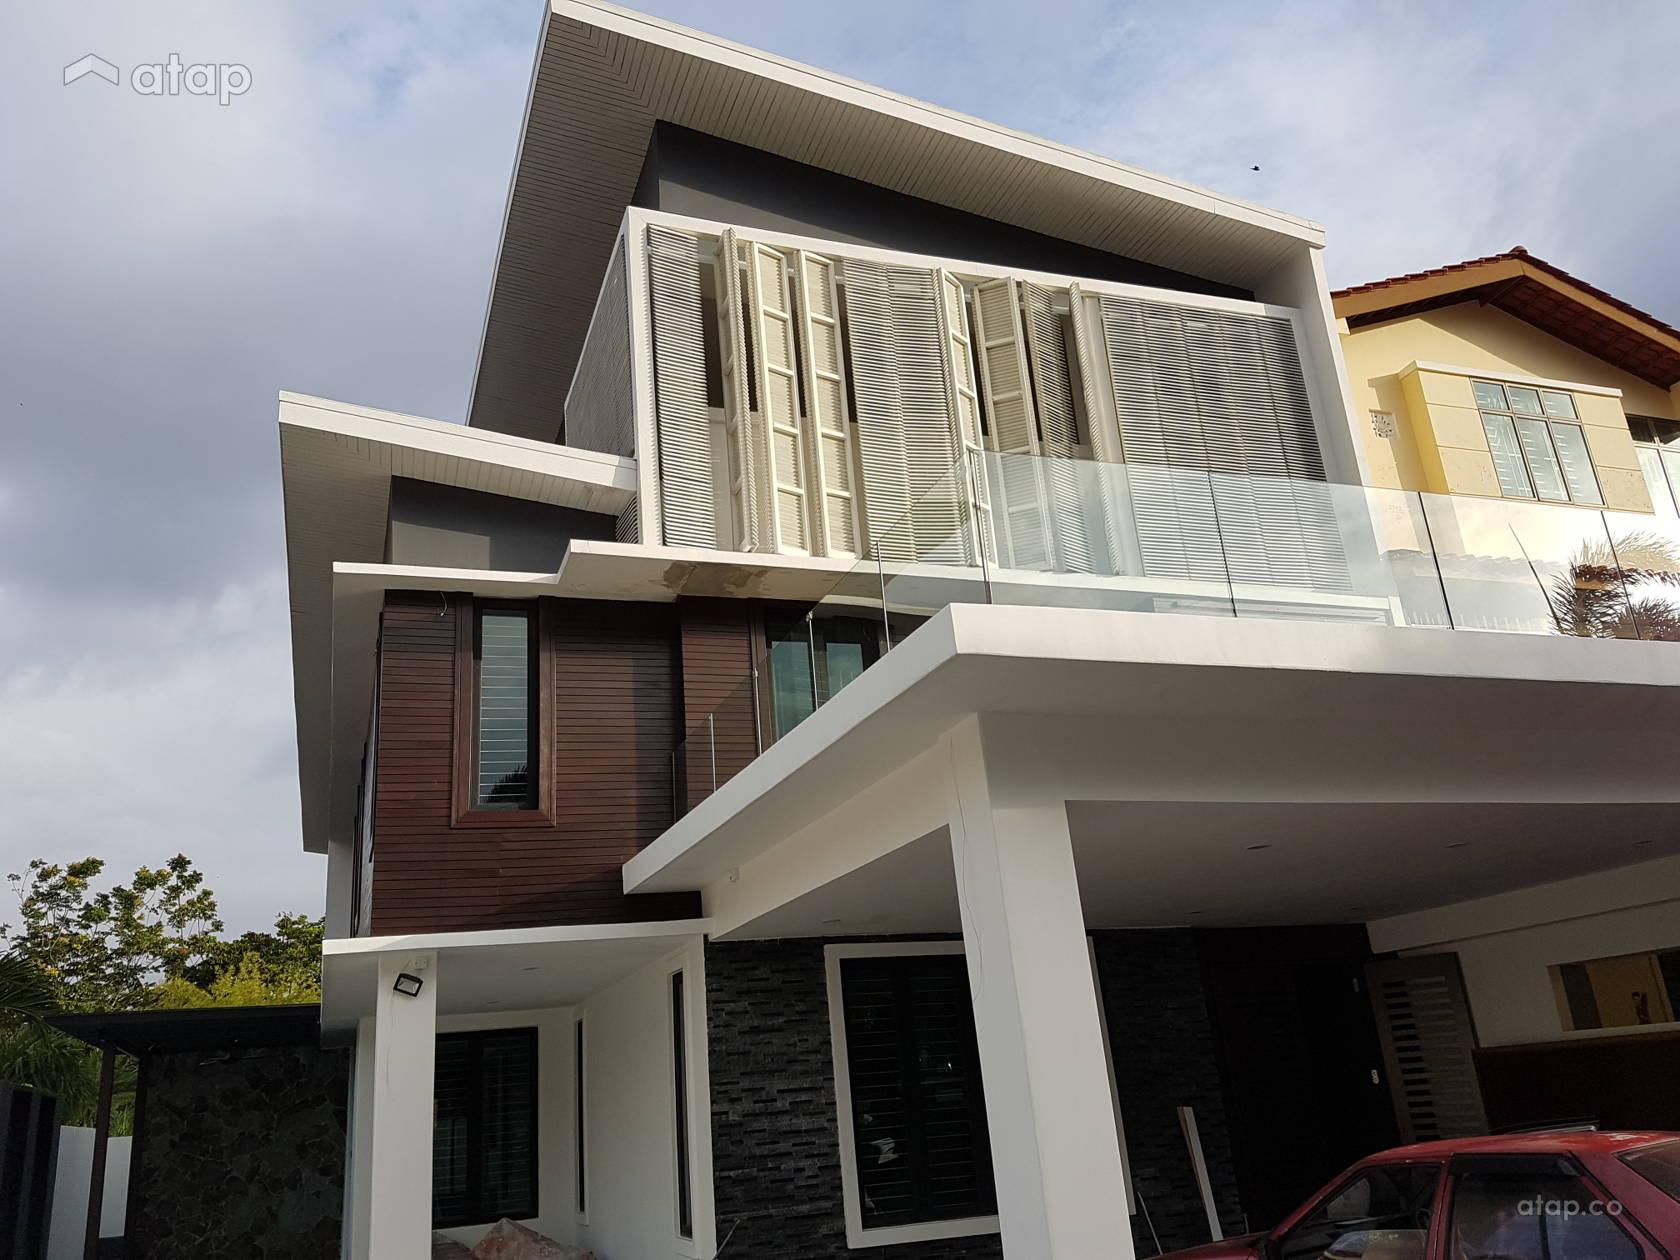 Minimalistic modern exterior taman sutera 3 storey terraced house share this professional